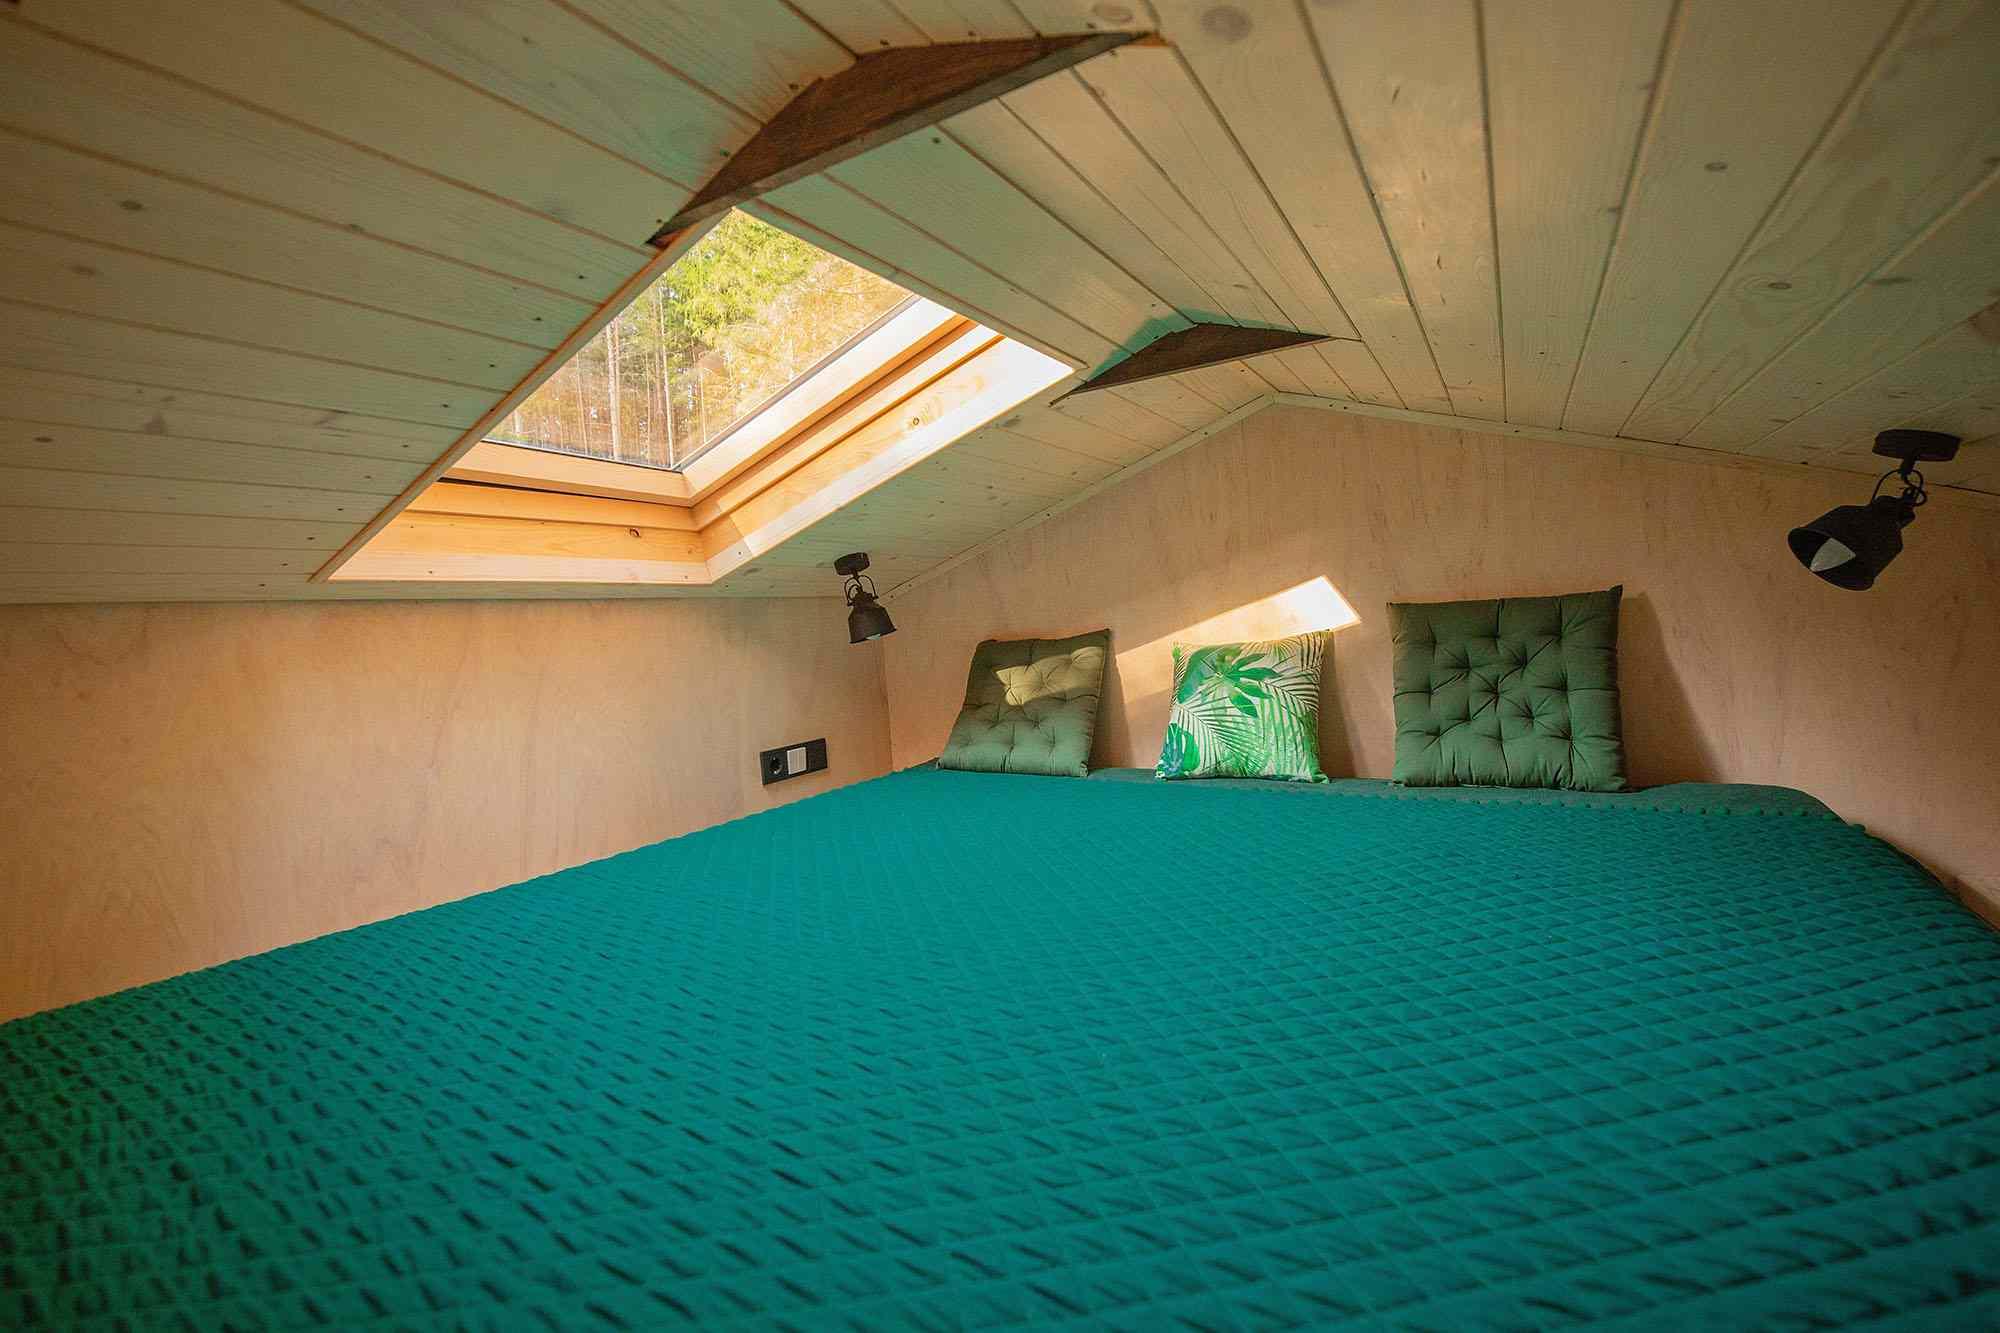 Projekt Datscha modern tiny house sleeping loft